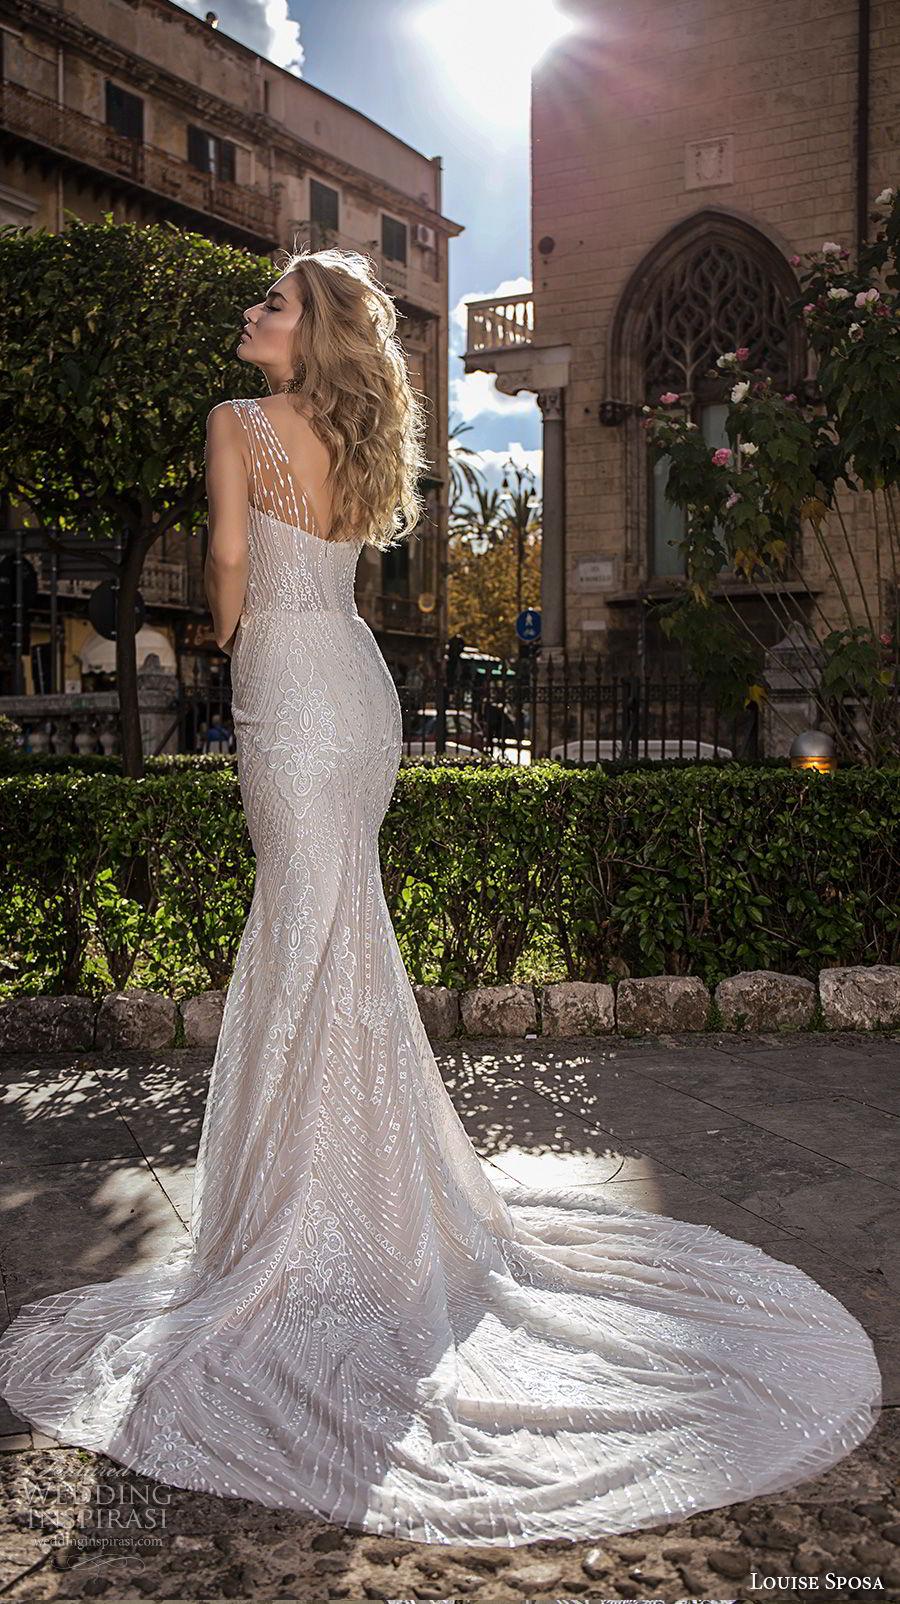 louise sposa 2018 bridal sleeveless with strap deep plunging v neck full embellishment fit and flare sheath wedding dress medium train (9) bv